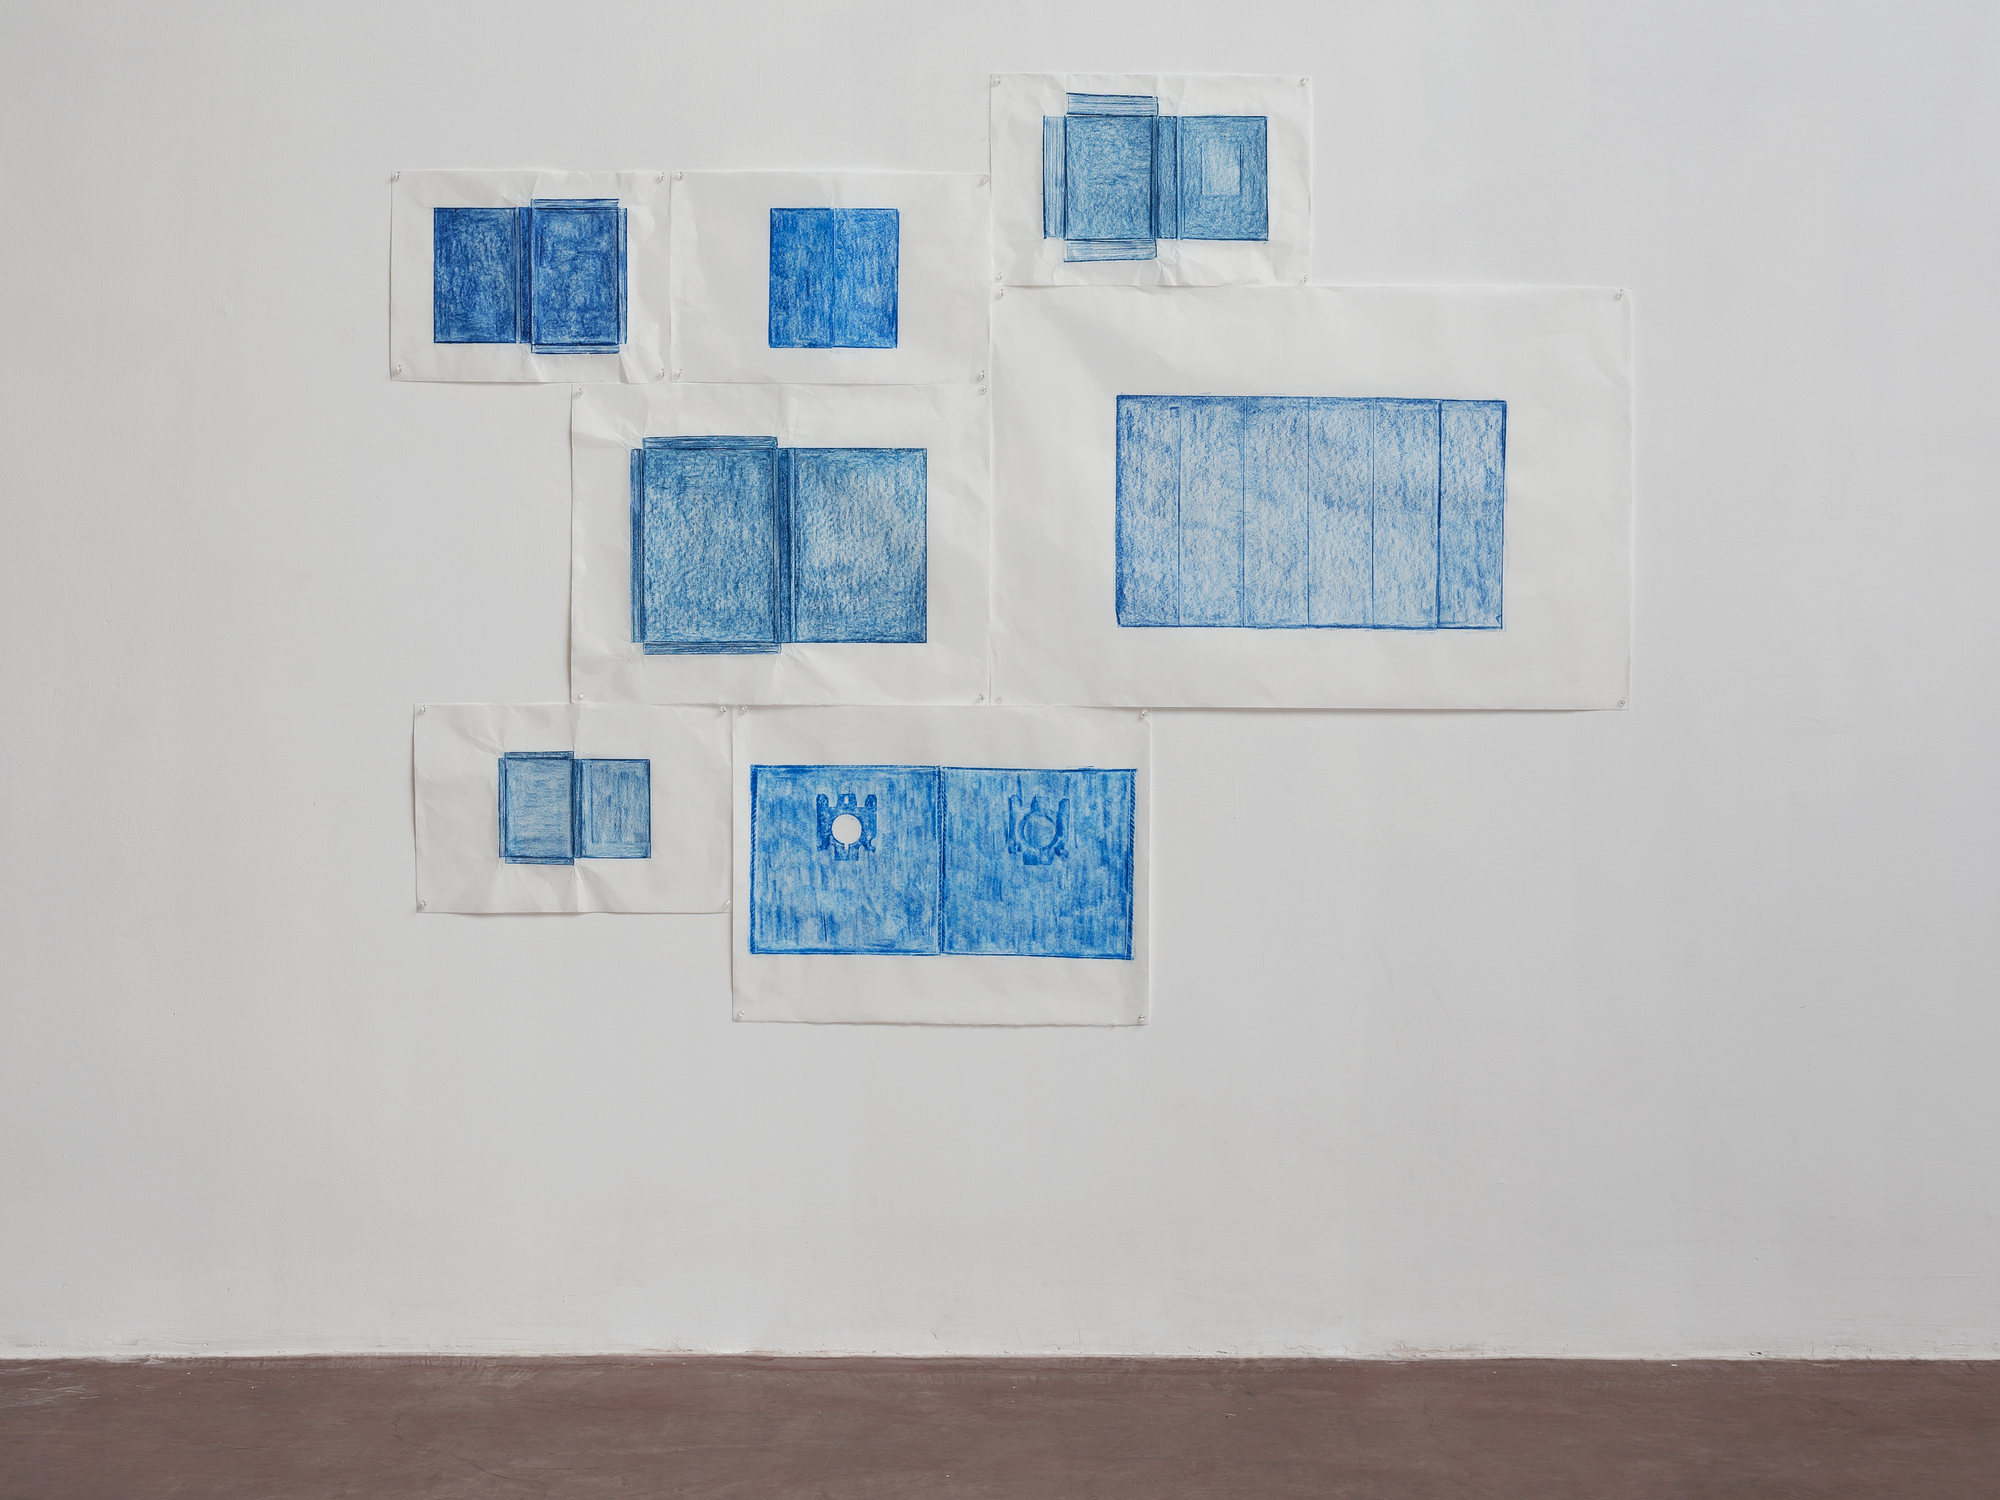 Jennifer Bornstein, Printed Matter, 2015, rubbing (encaustic and wax on Kozo paper), 145 x 190 cm, unique